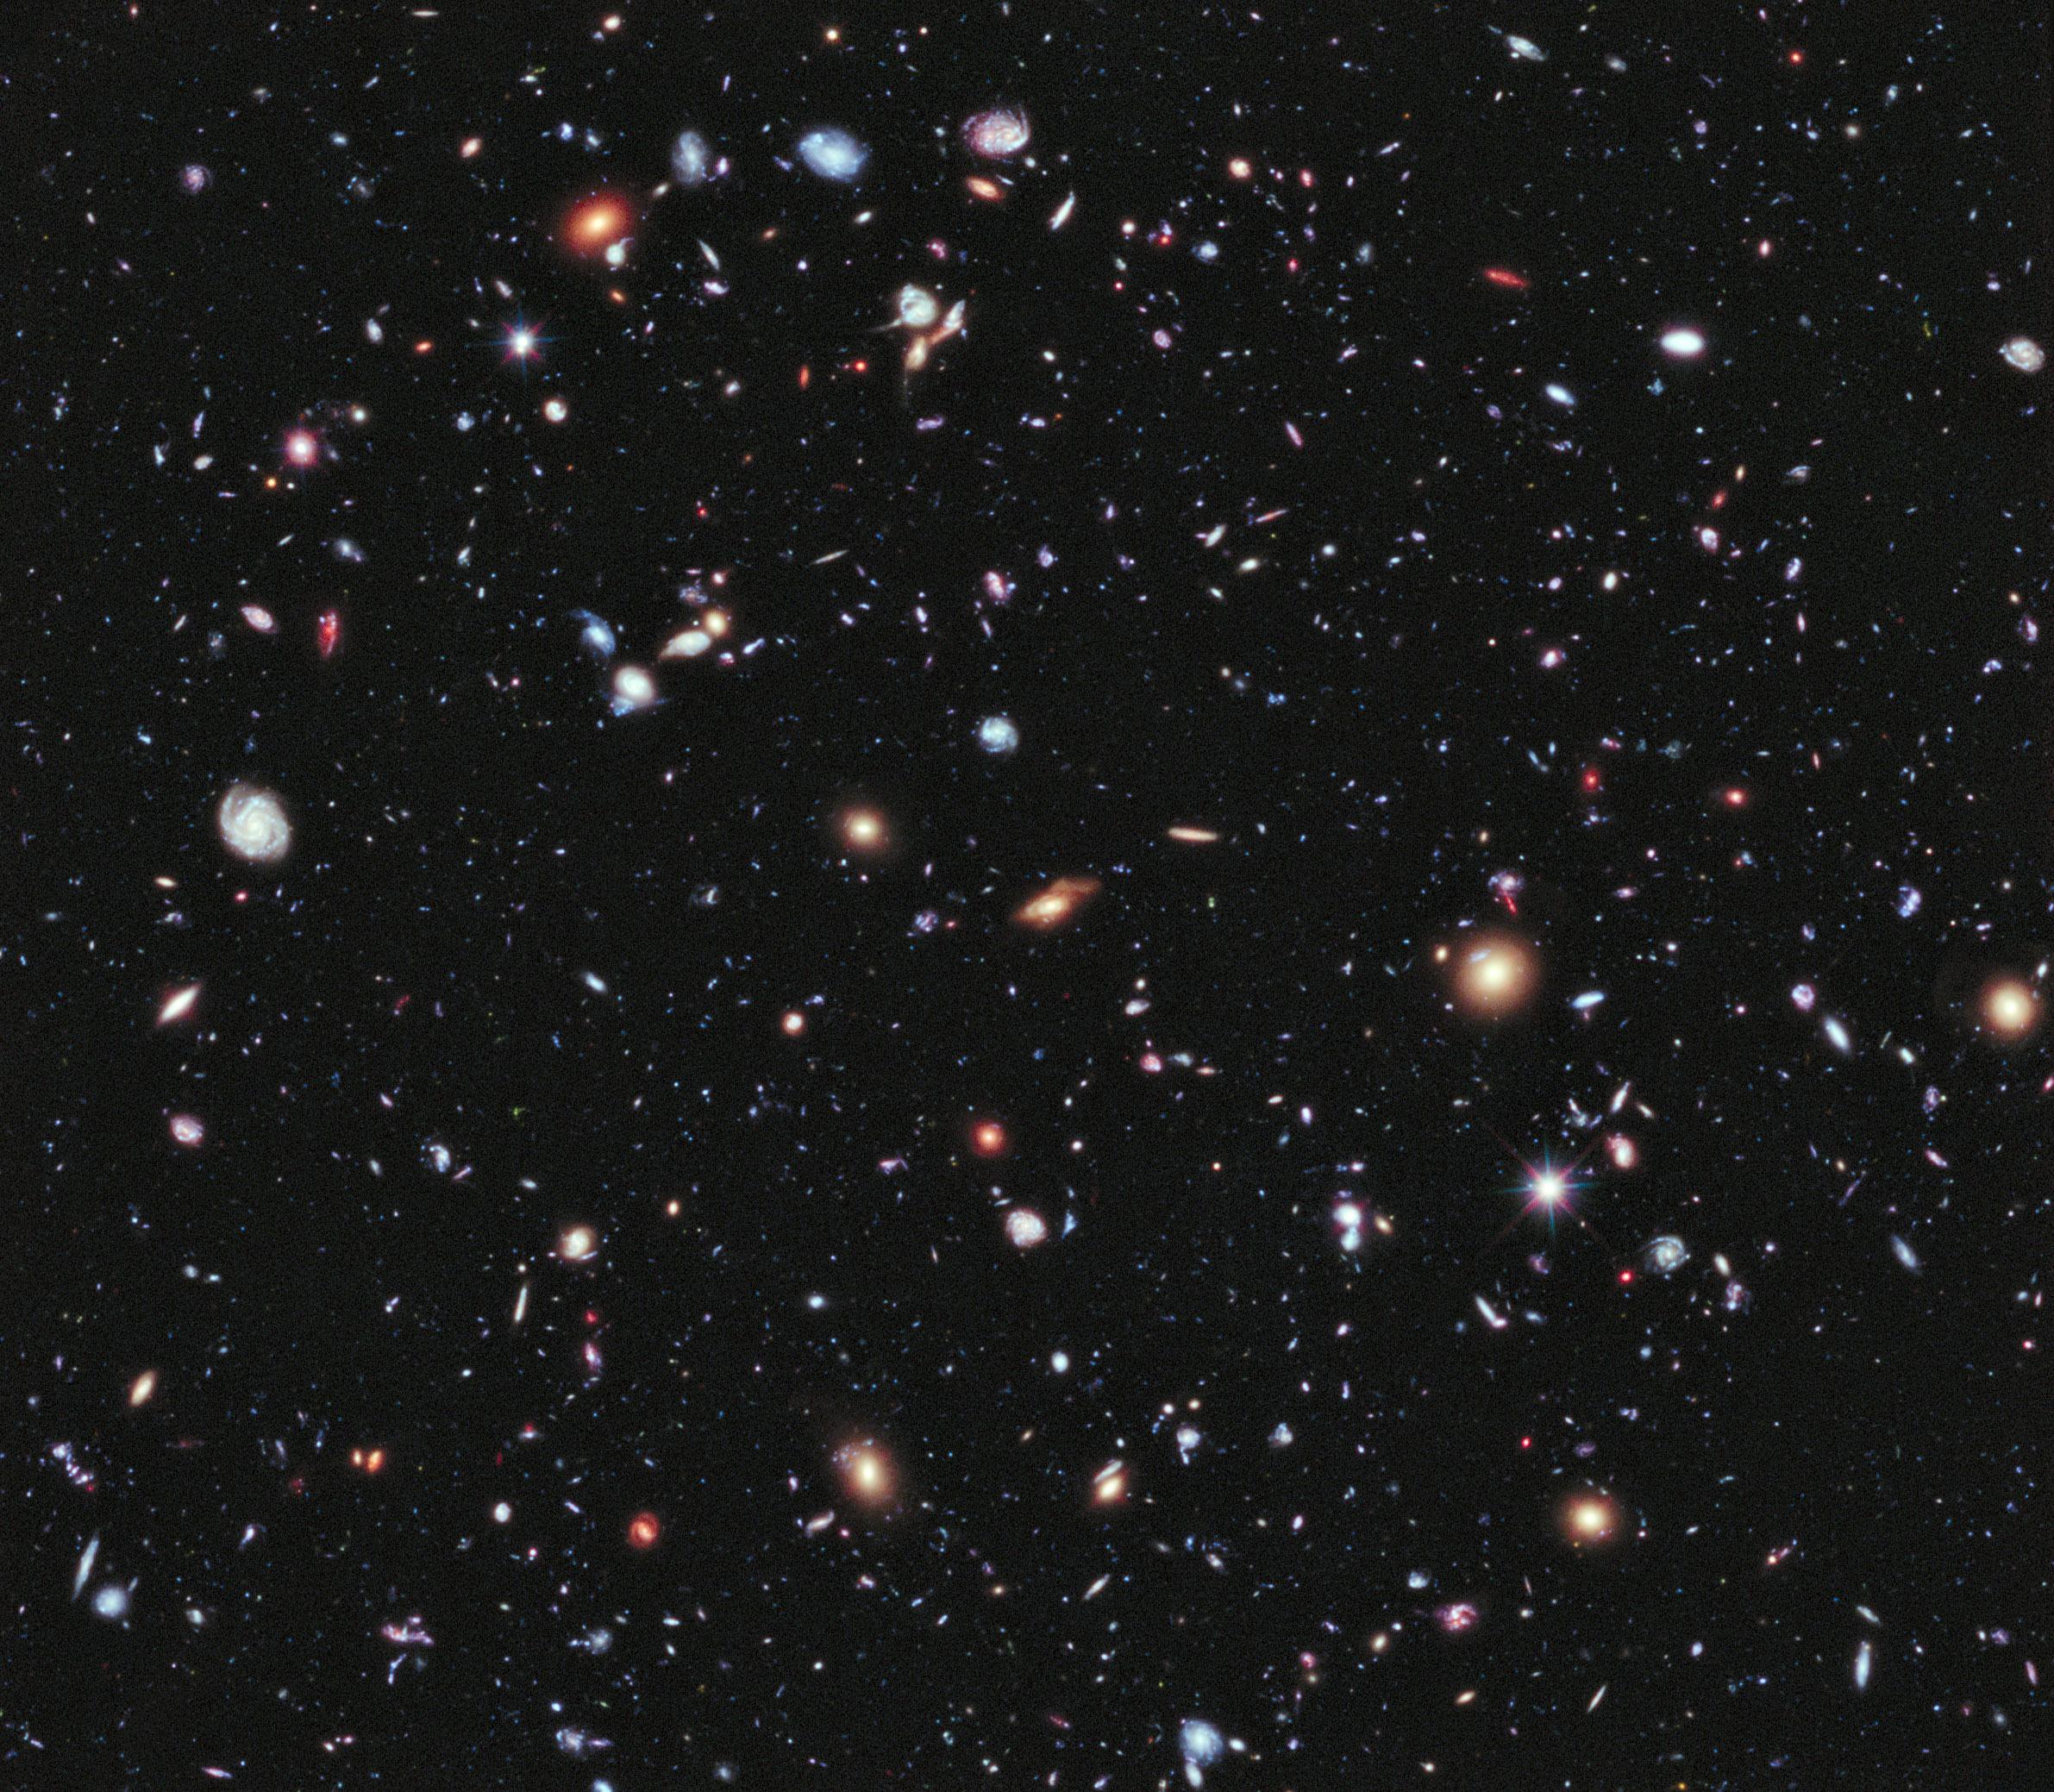 Image credit: NASA; ESA; G. Illingworth, D. Magee, and P. Oesch, University of California, Santa Cruz; R. Bouwens, Leiden University; and the HUDF09 Team